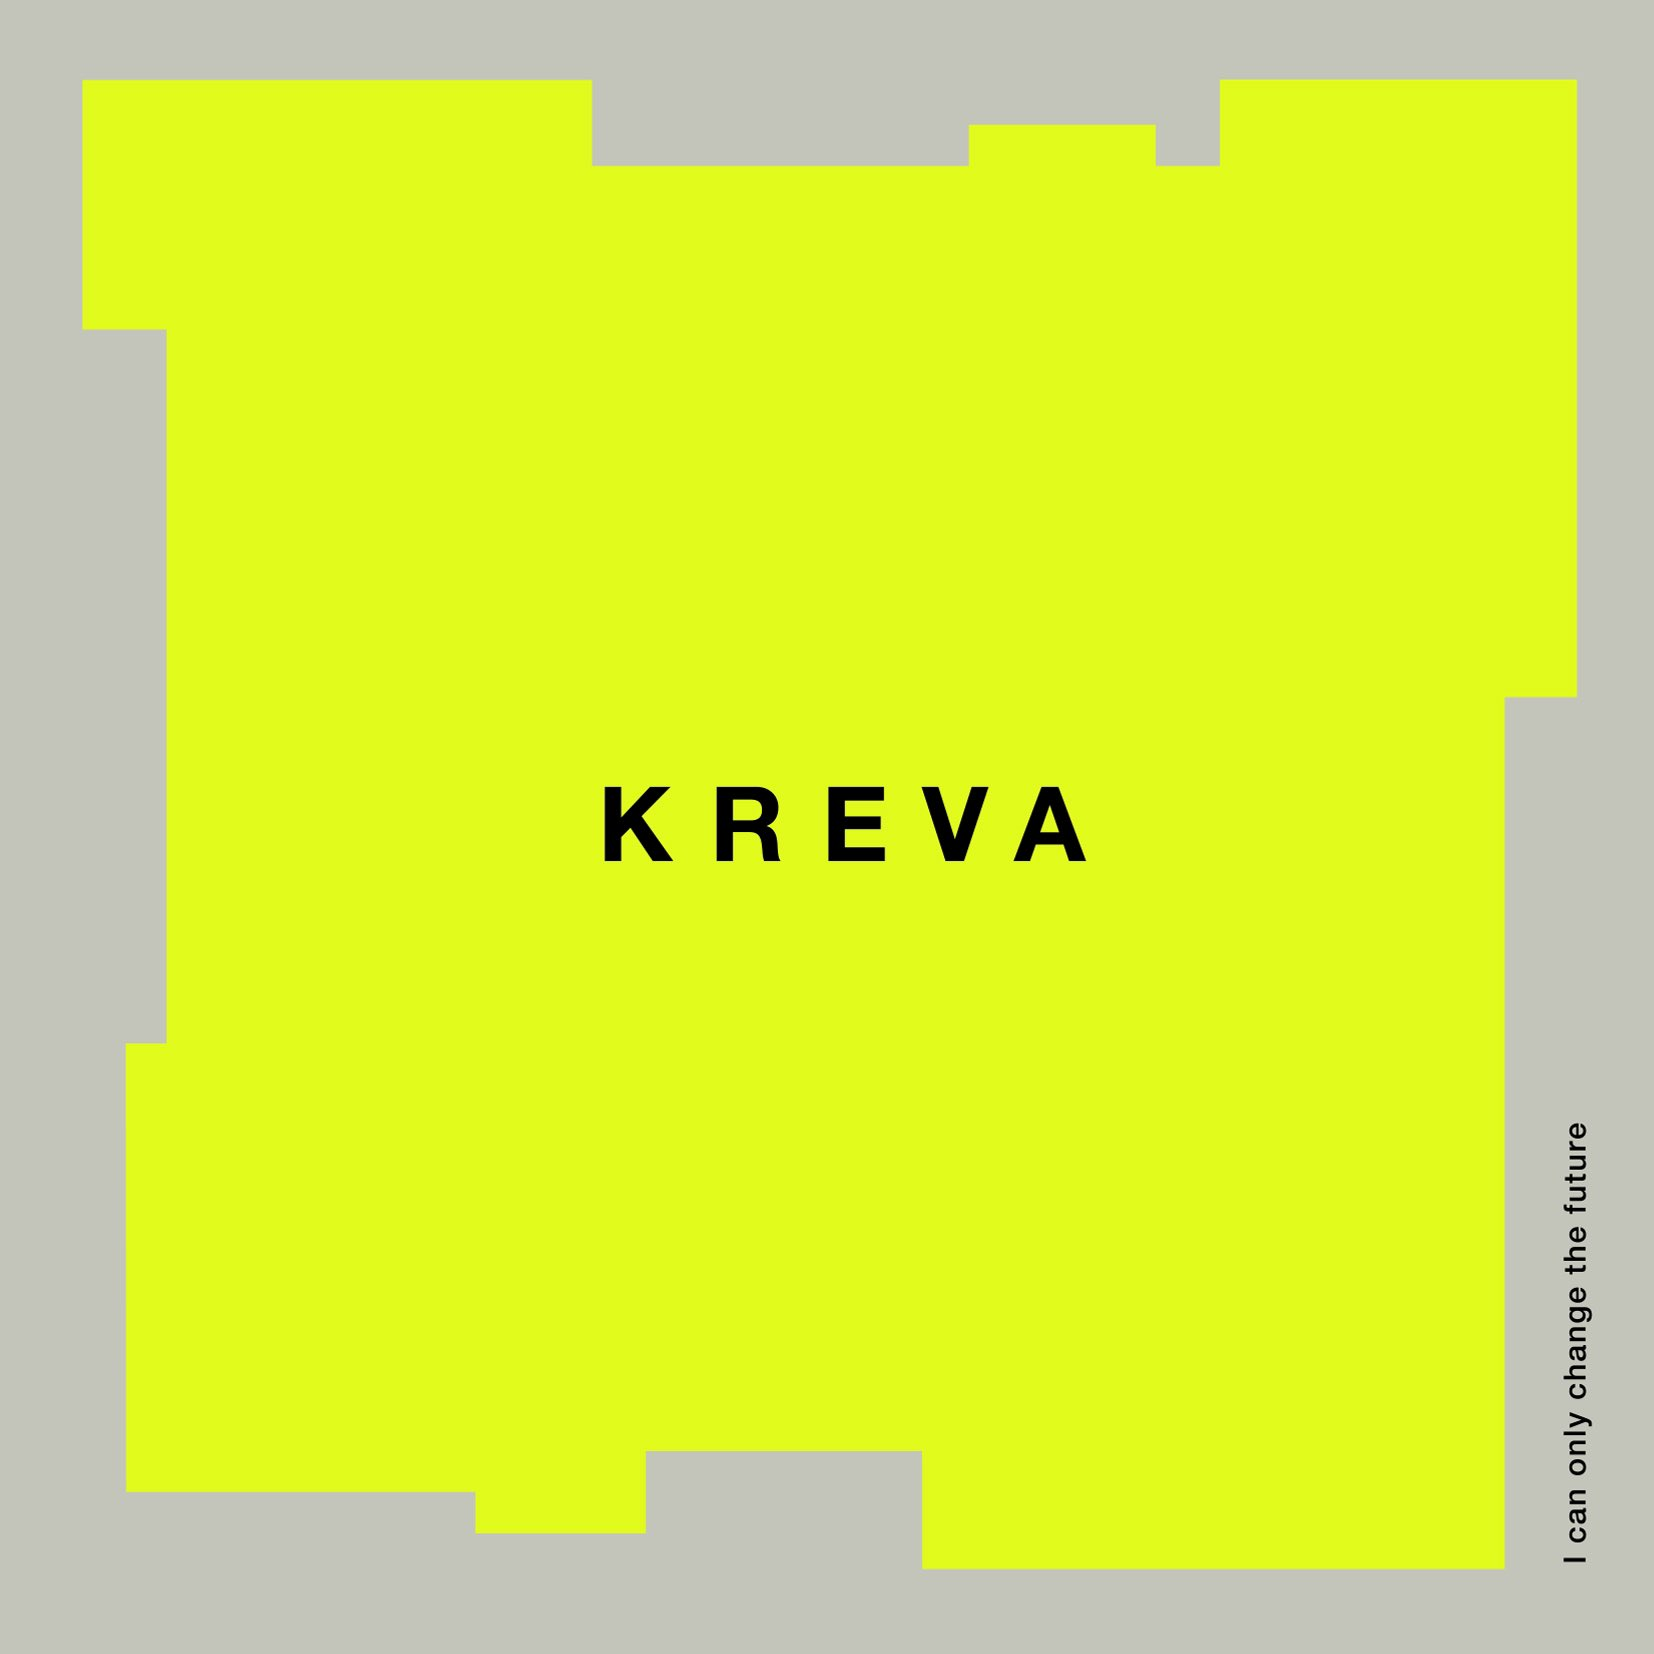 KREVA - 変えられるのは未来だけ